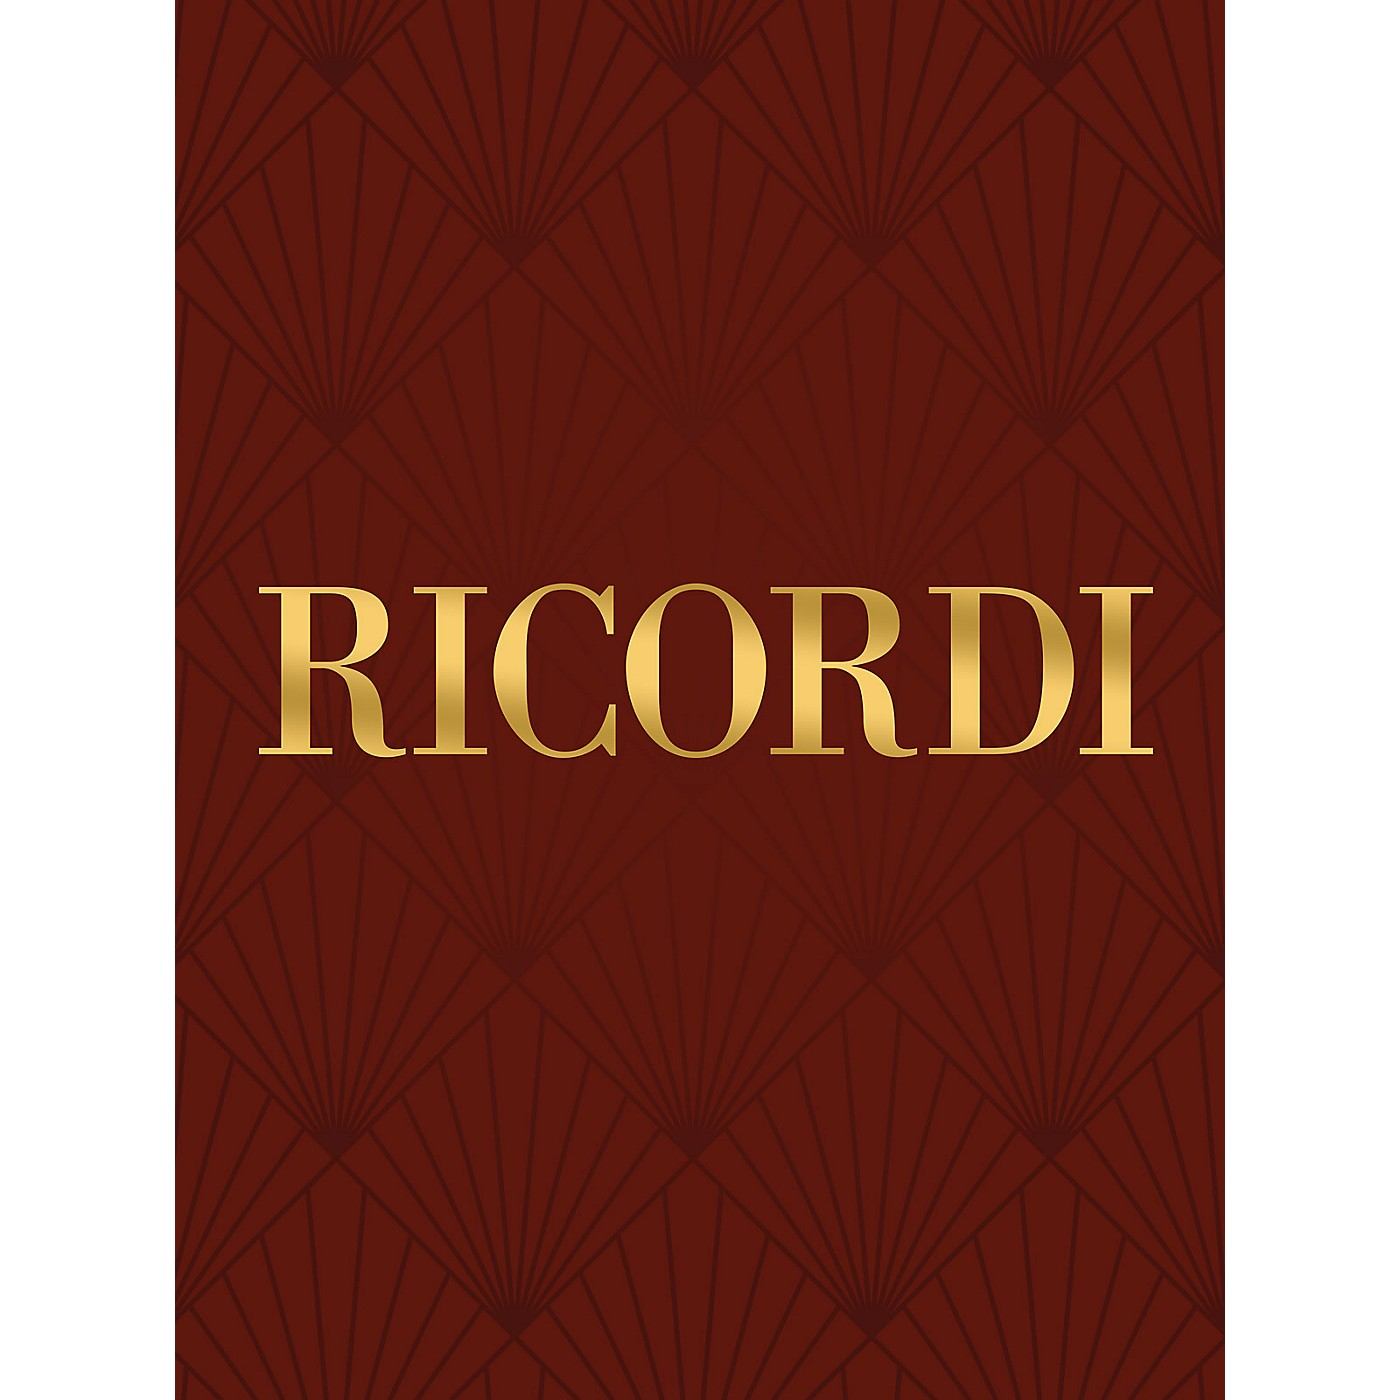 Ricordi Variazioni appendi (all voices): Traditional Cadenzas Vocal Method Series Composed by Luigi Ricci thumbnail